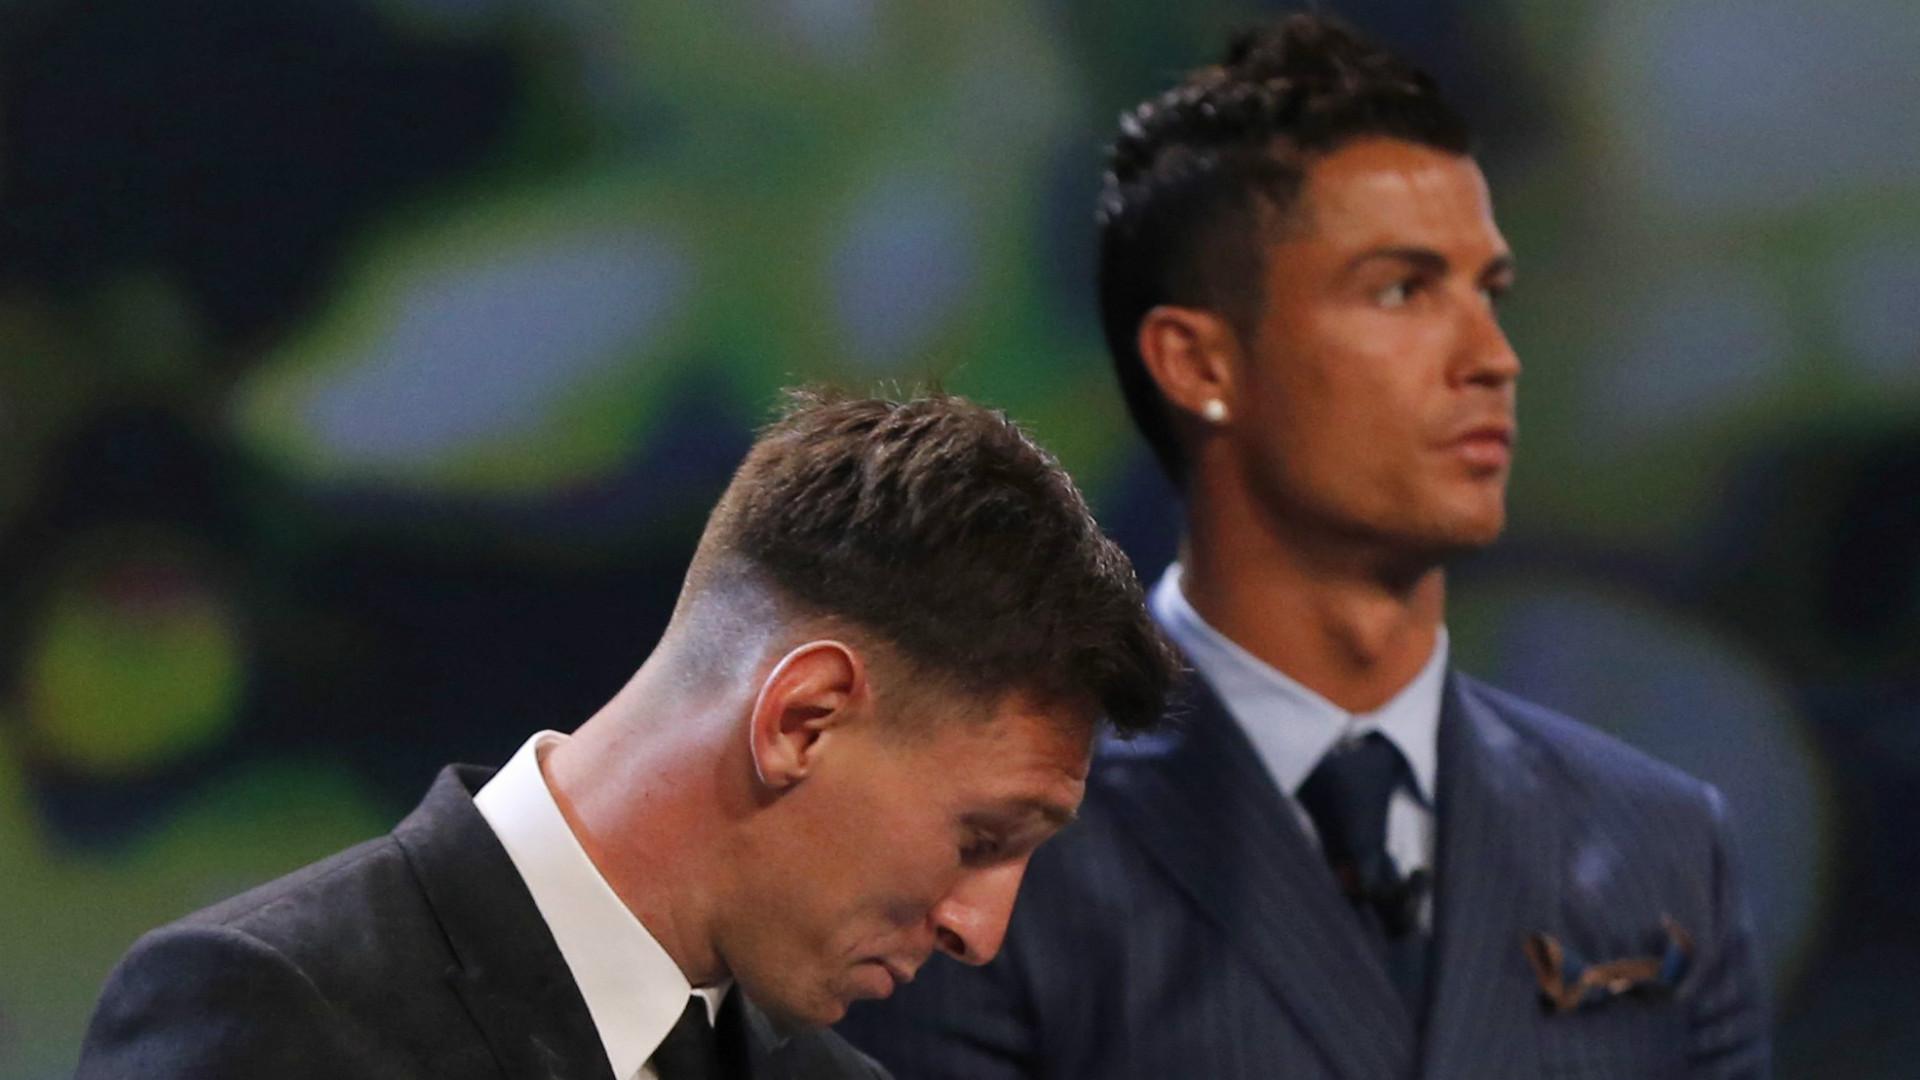 lionel messi cristiano ronaldo uefa champions league group stage draw ceremony 27082015